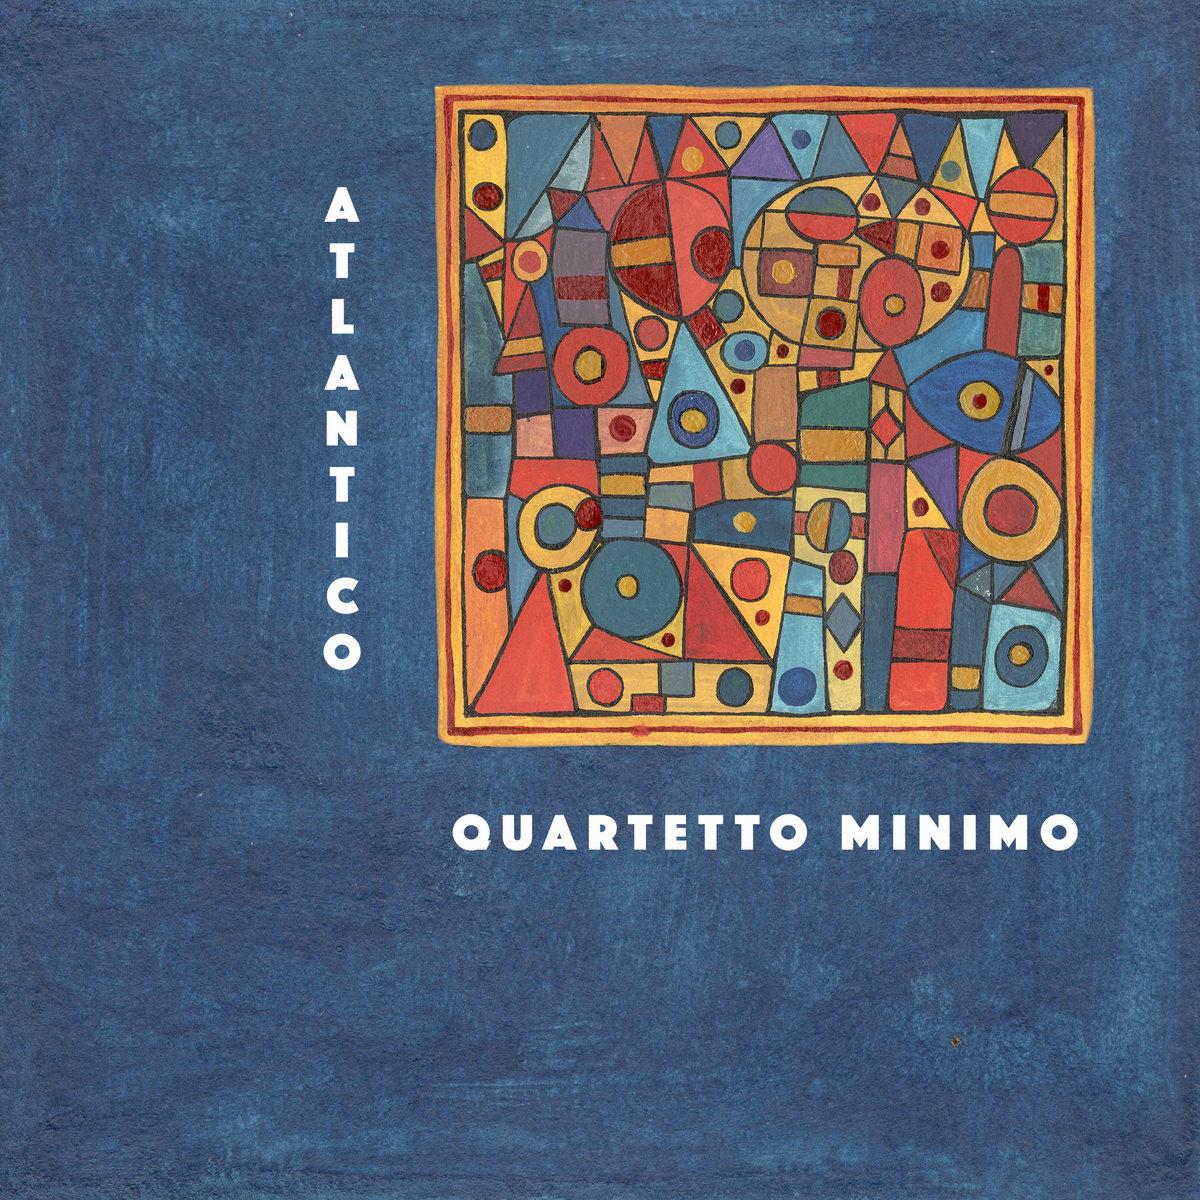 Atlantico | Quartetto Minimo